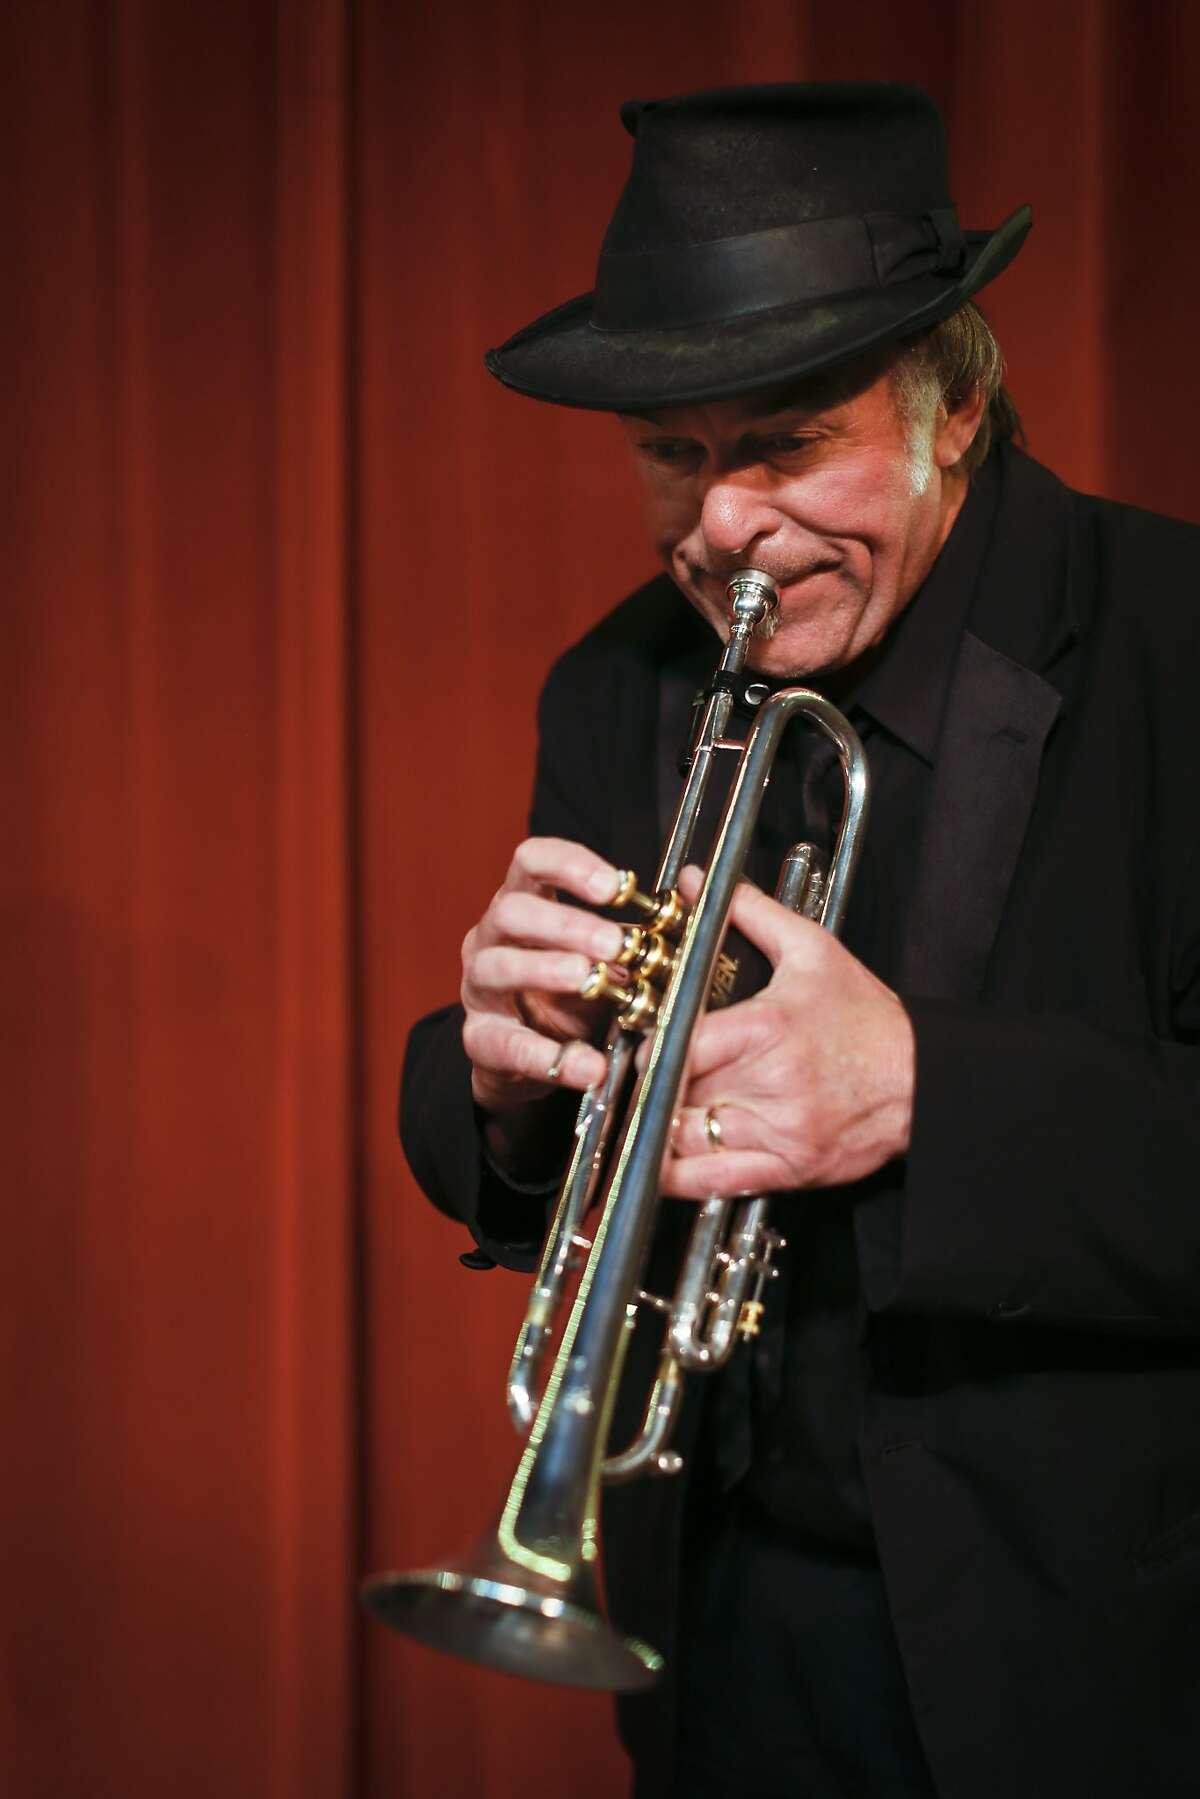 Beach Blanket Babylon trumpet player Steve Salgo is seen in Club Fugazi on Friday, April 11, 2014 in San Francisco, Calif.